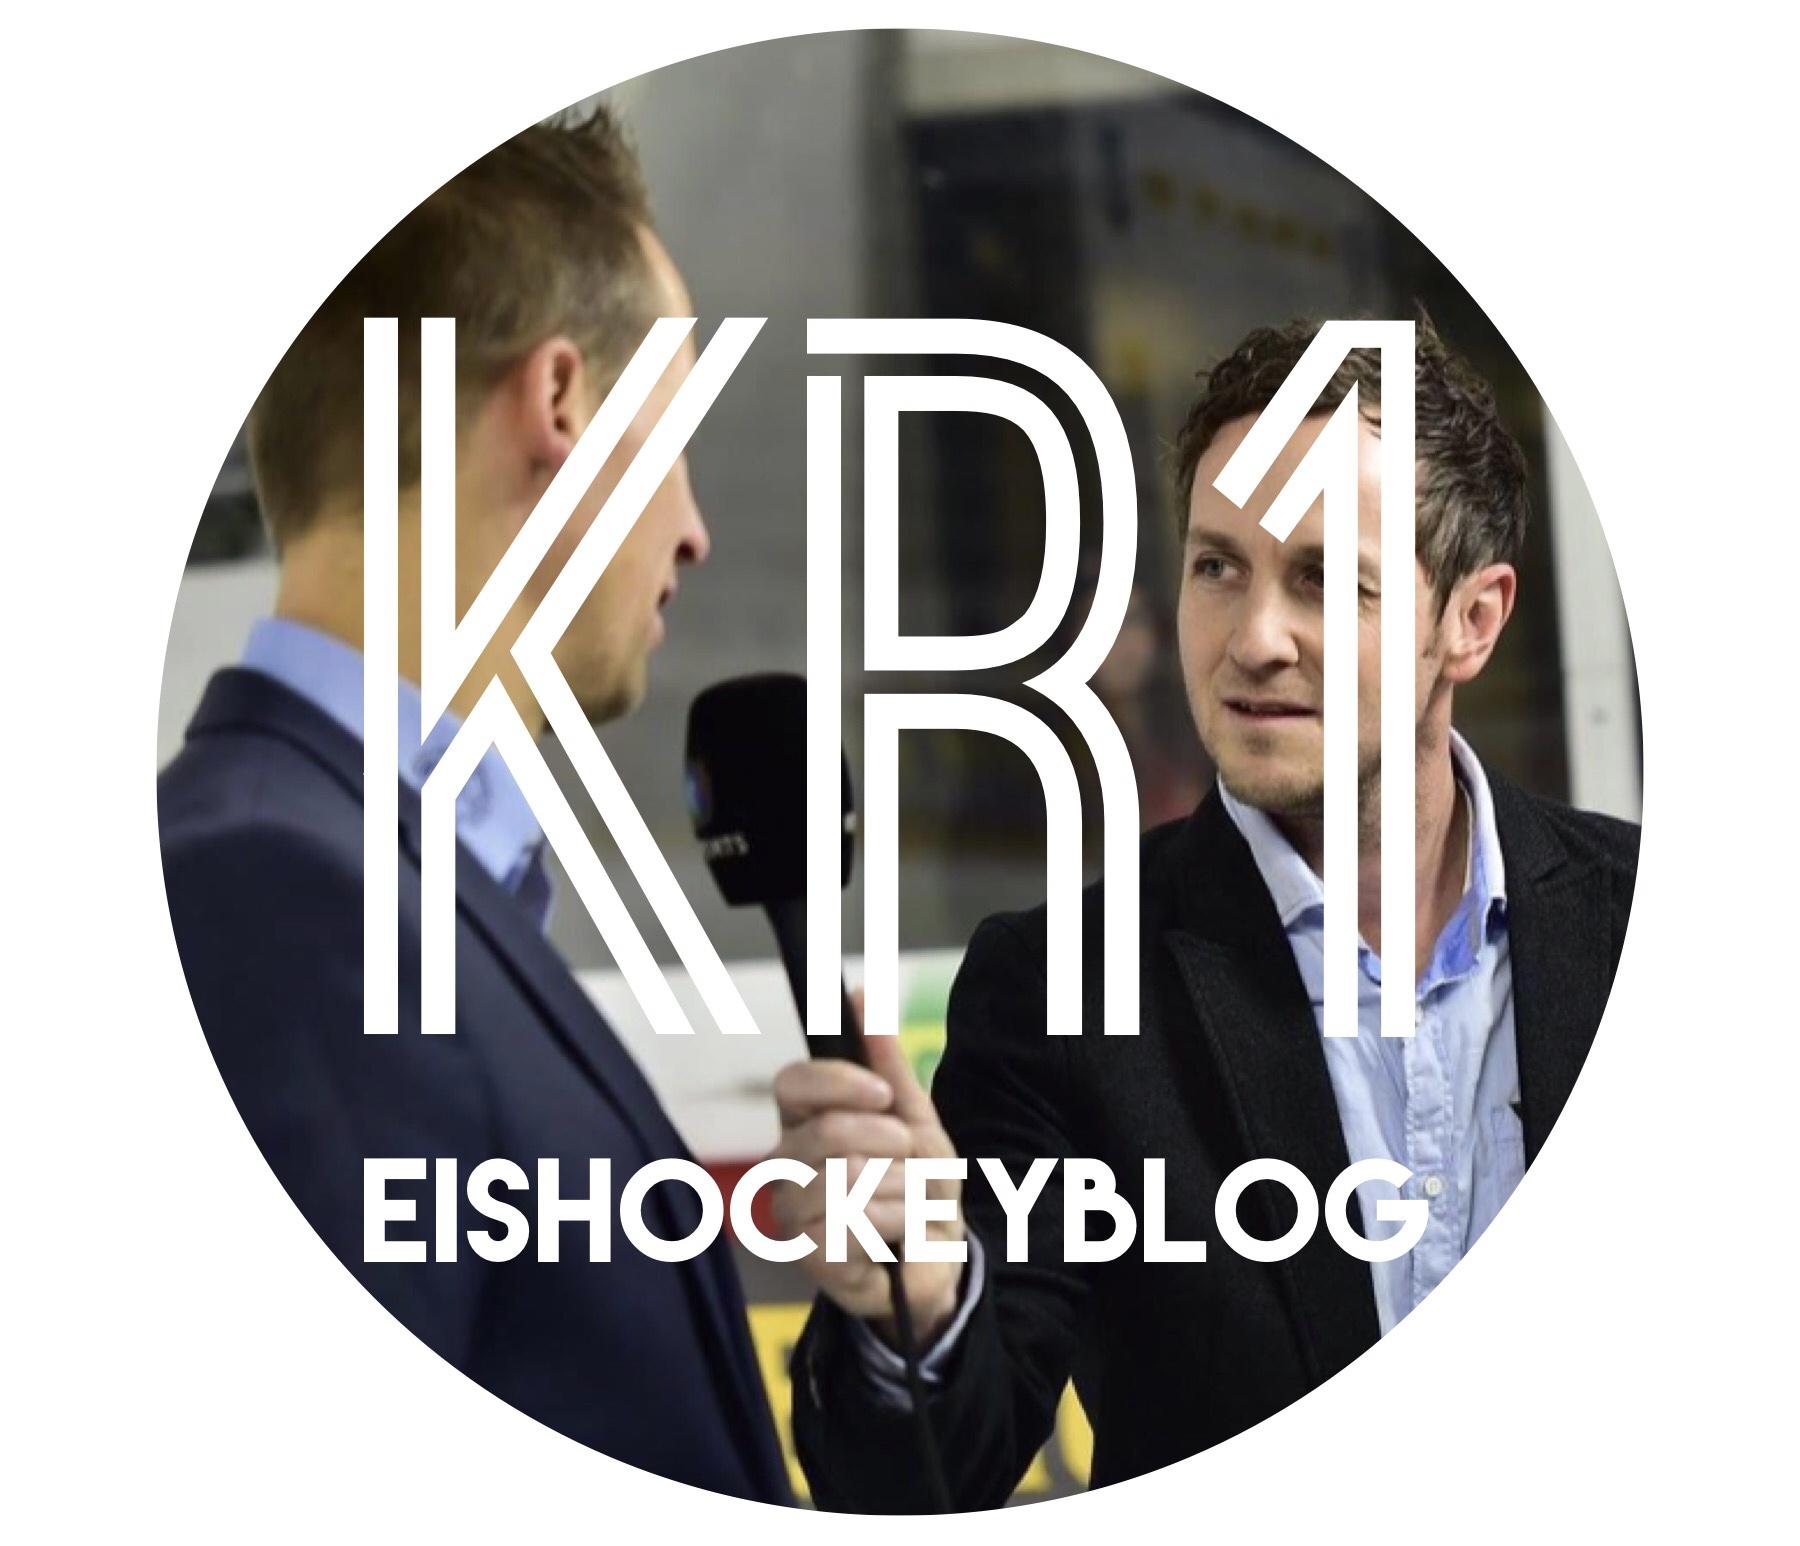 KR1 eishockeyblog